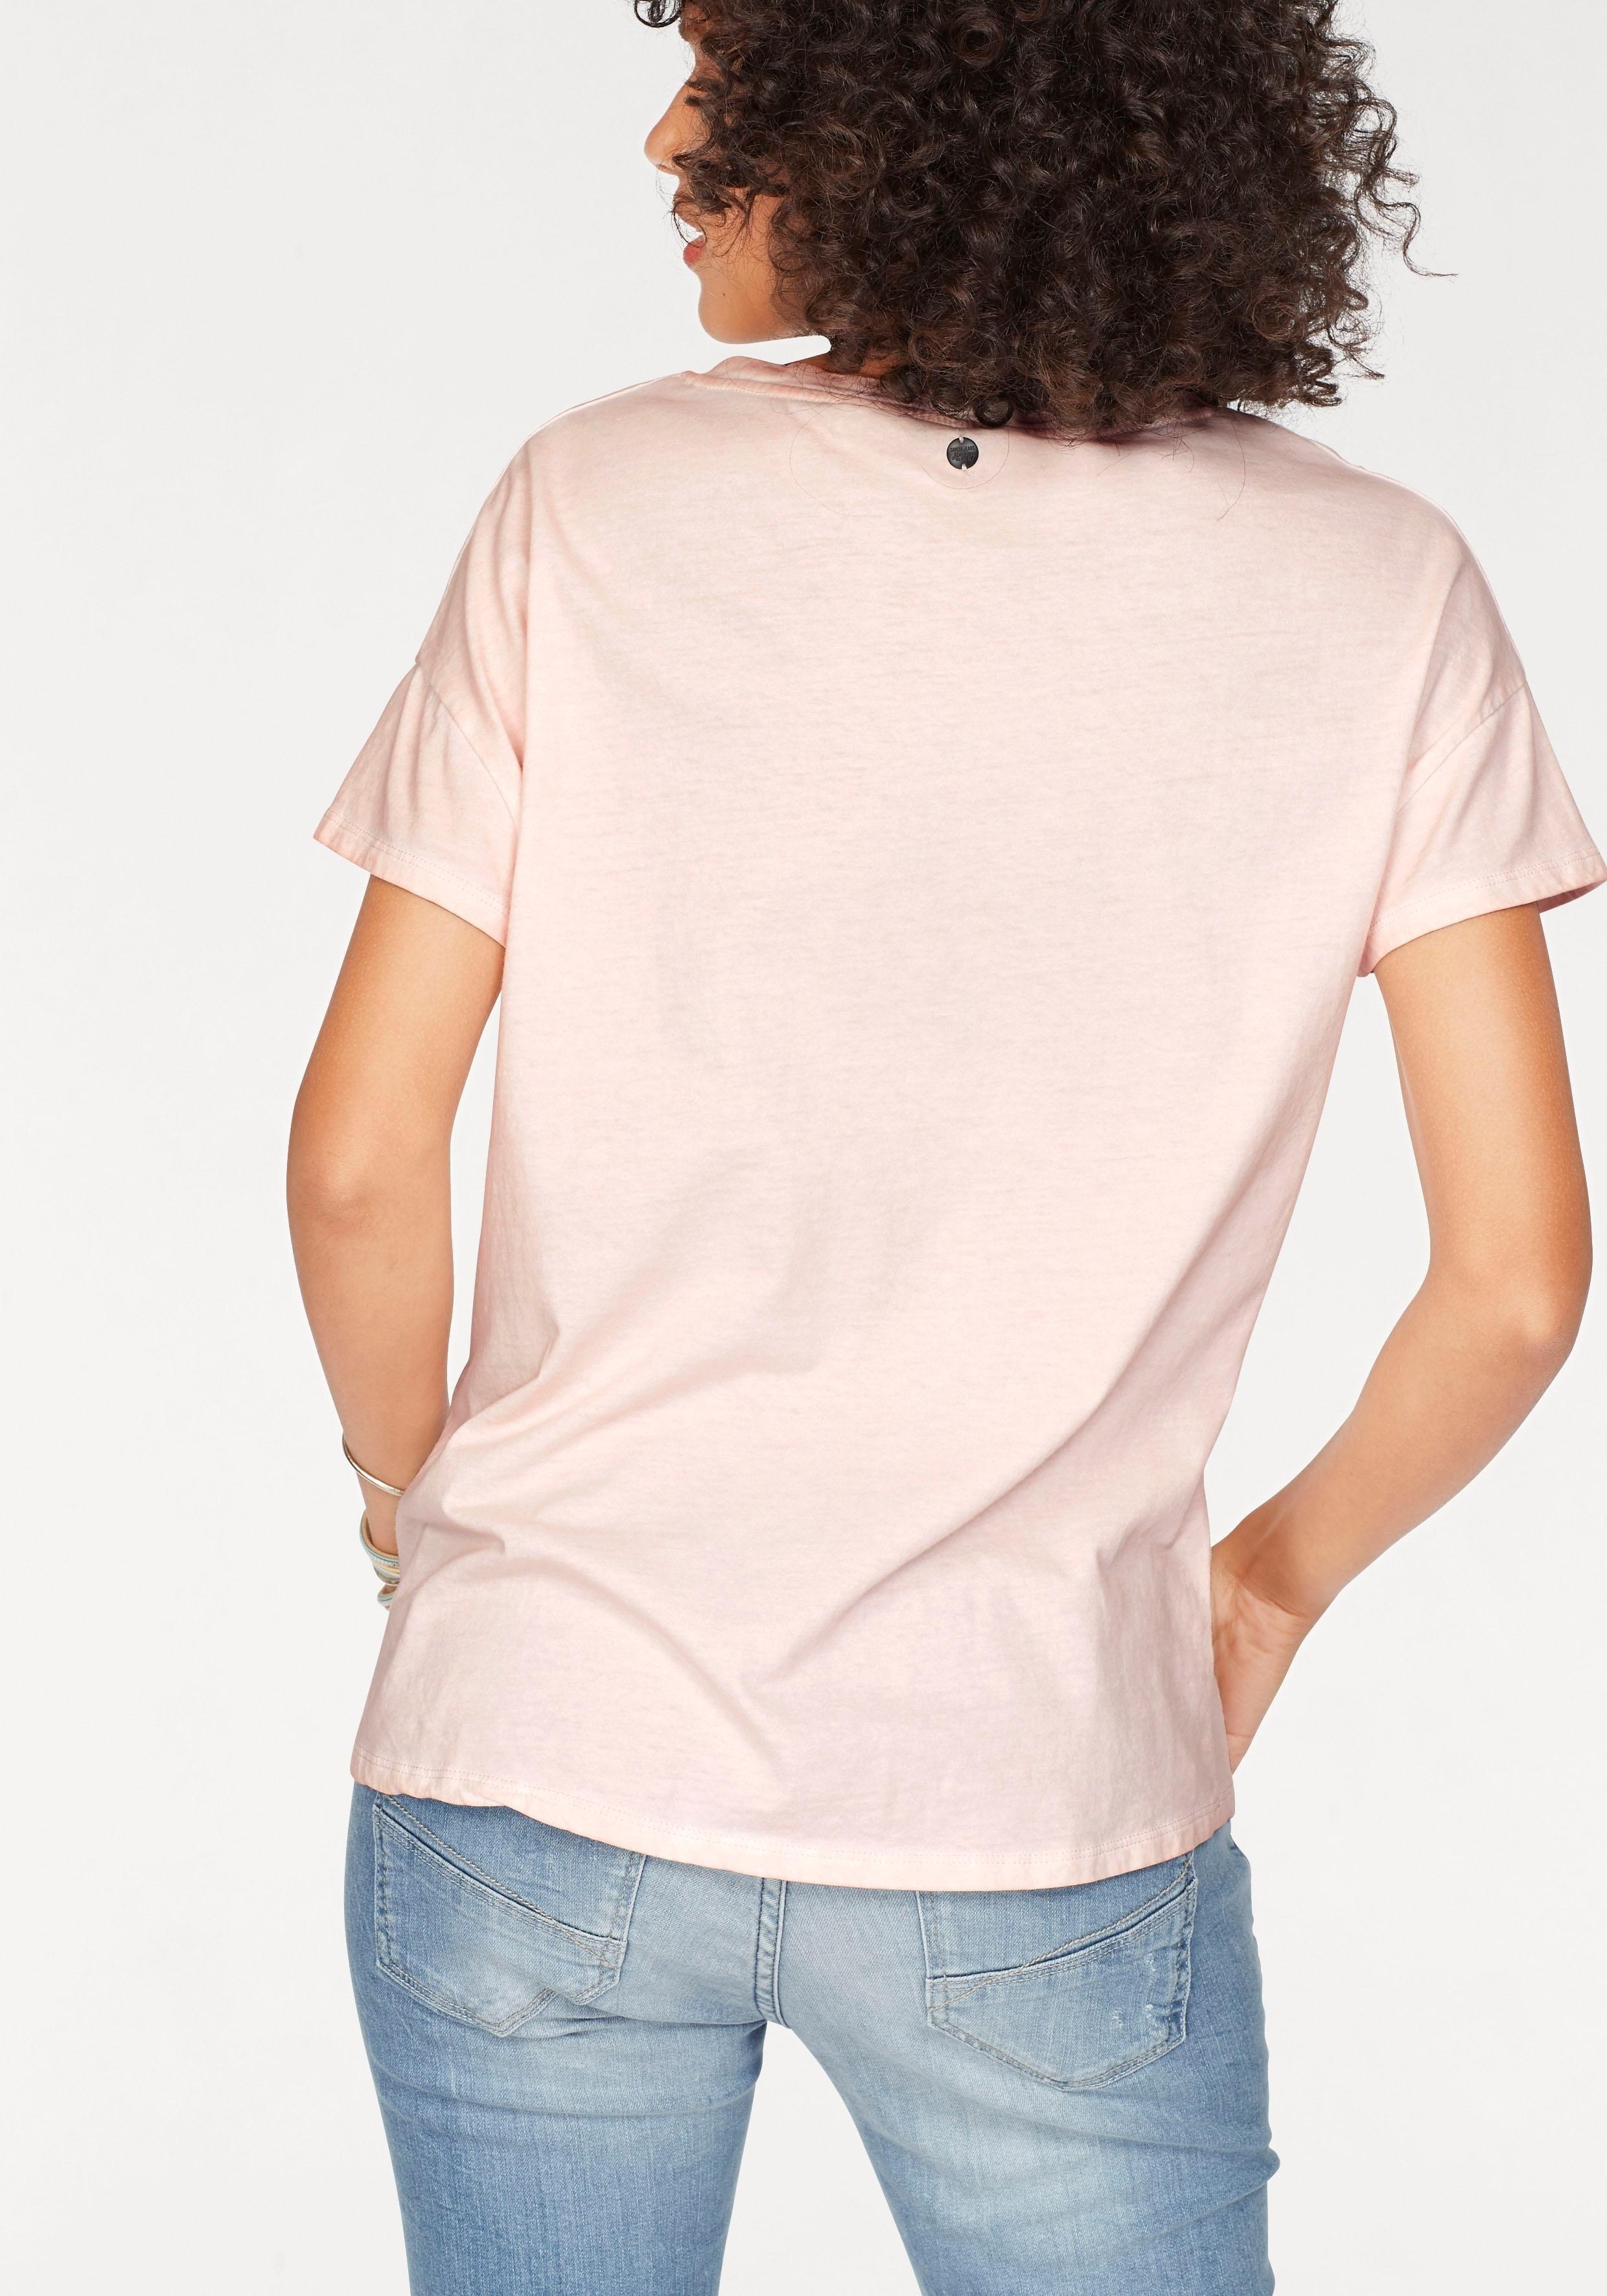 shirt Garcia Garcia shirt Makkelijk Garcia Besteld T Makkelijk Besteld T 1KlTFJ3uc